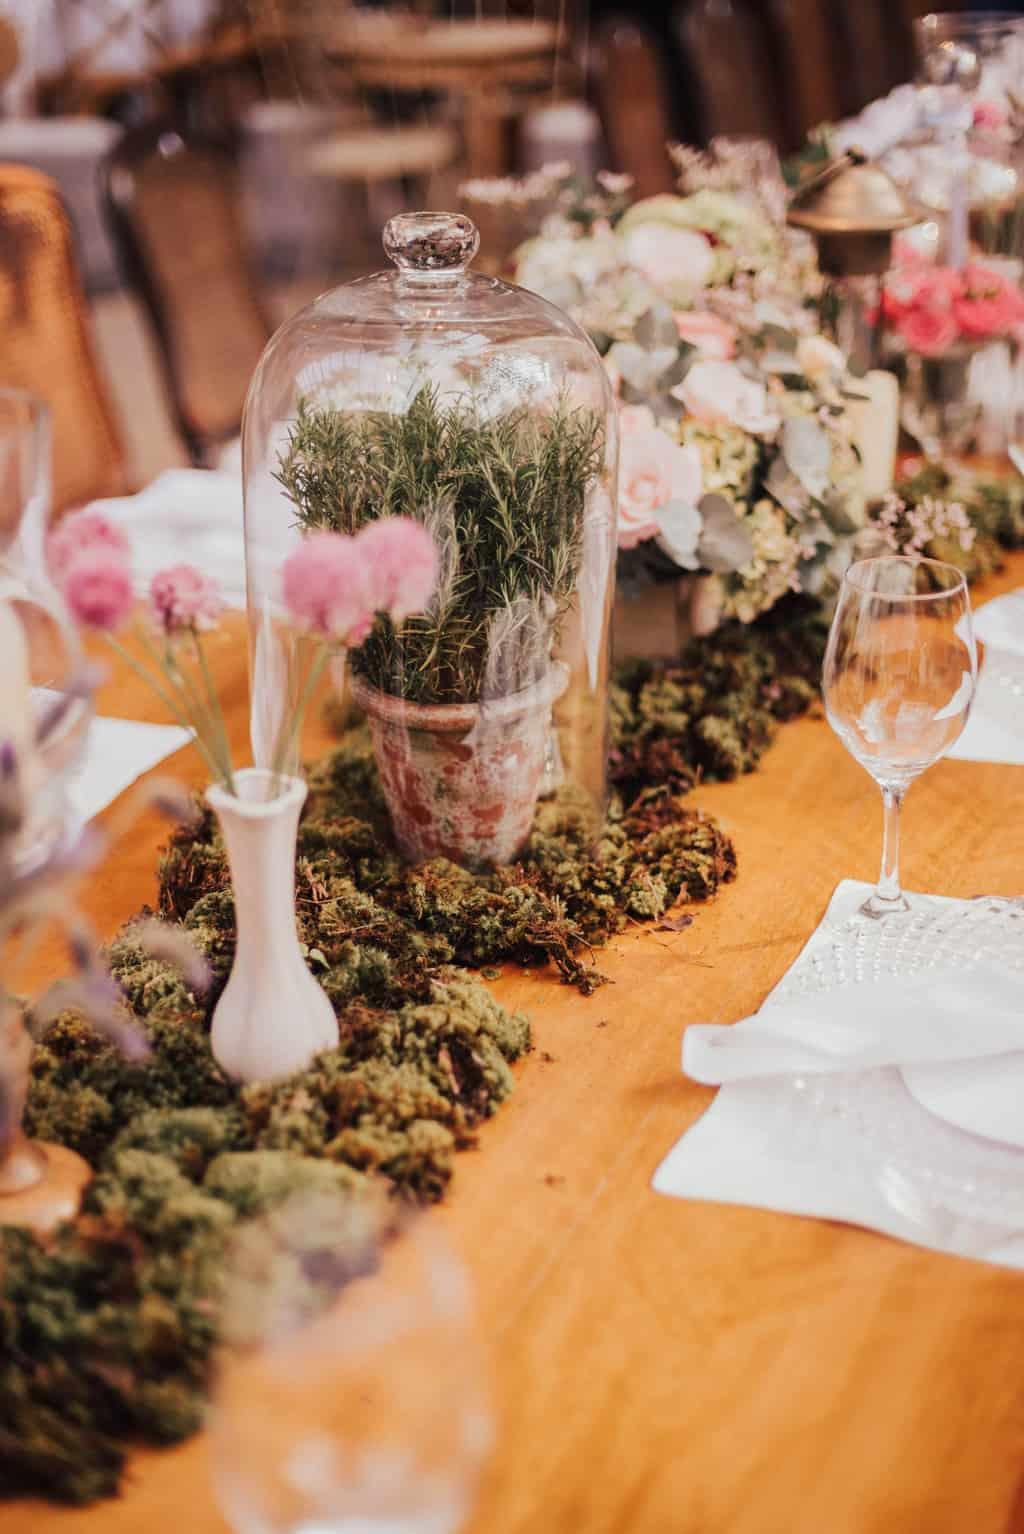 Boutique-de-Cena-casamento-Rebeca-e-Eldrey-Fazenda-Vila-Rica-Fotografia-Mana-Gollo-mesa-dos-convidados-Toda-de-Branco21